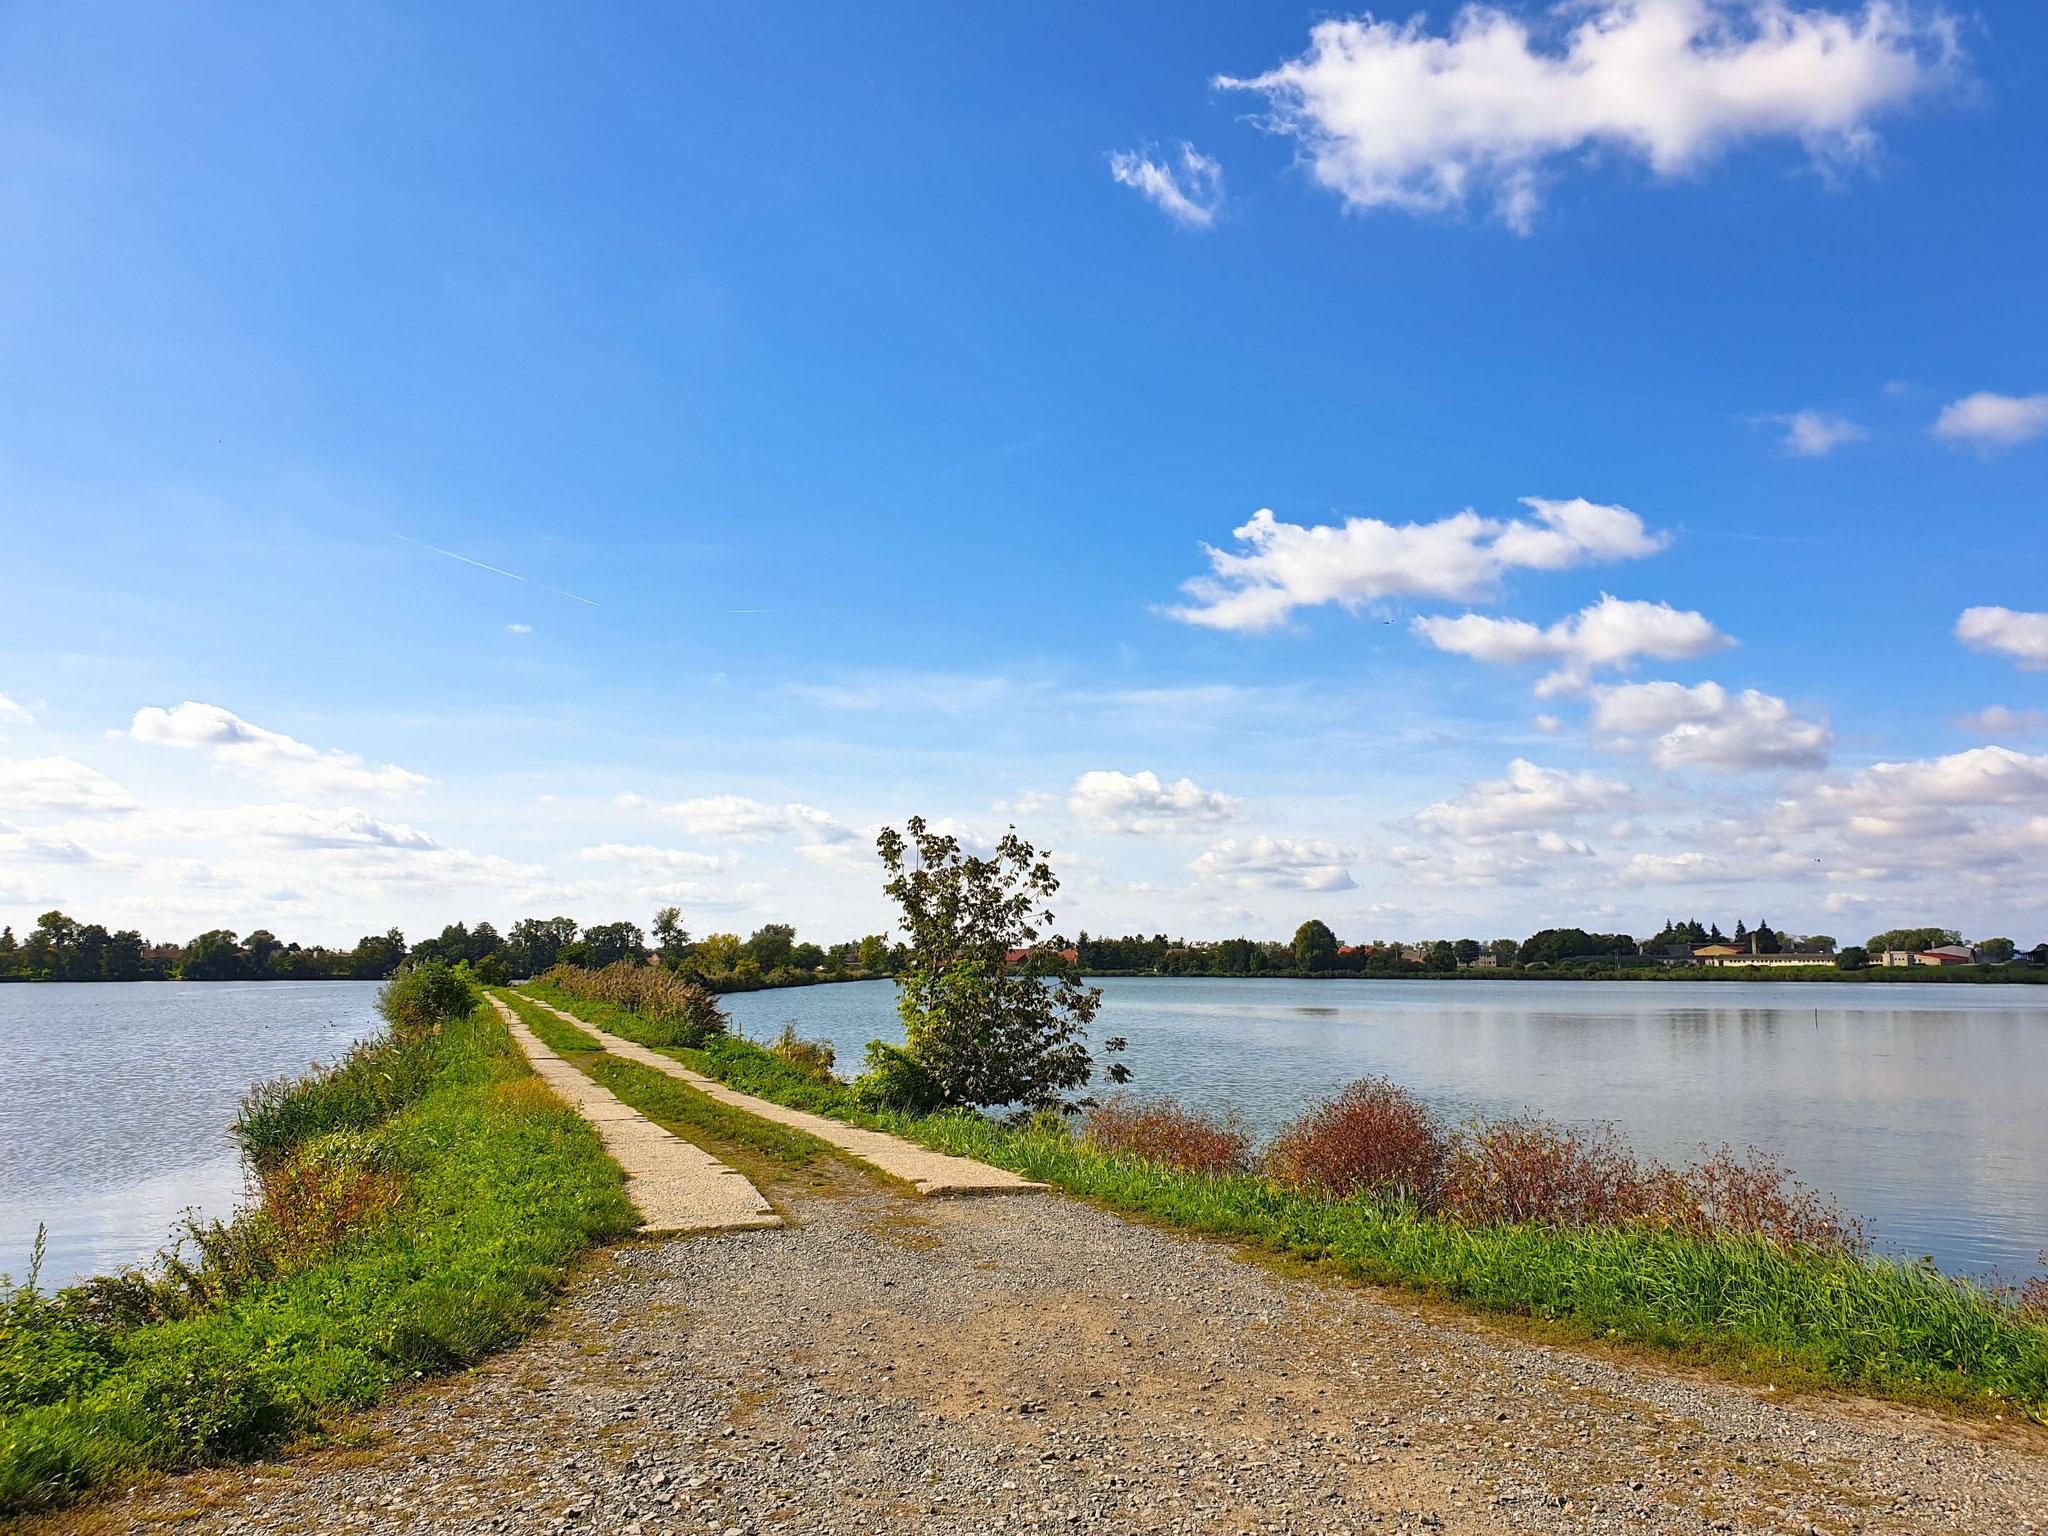 Hradecký rybník, wir fahren übers Wasser